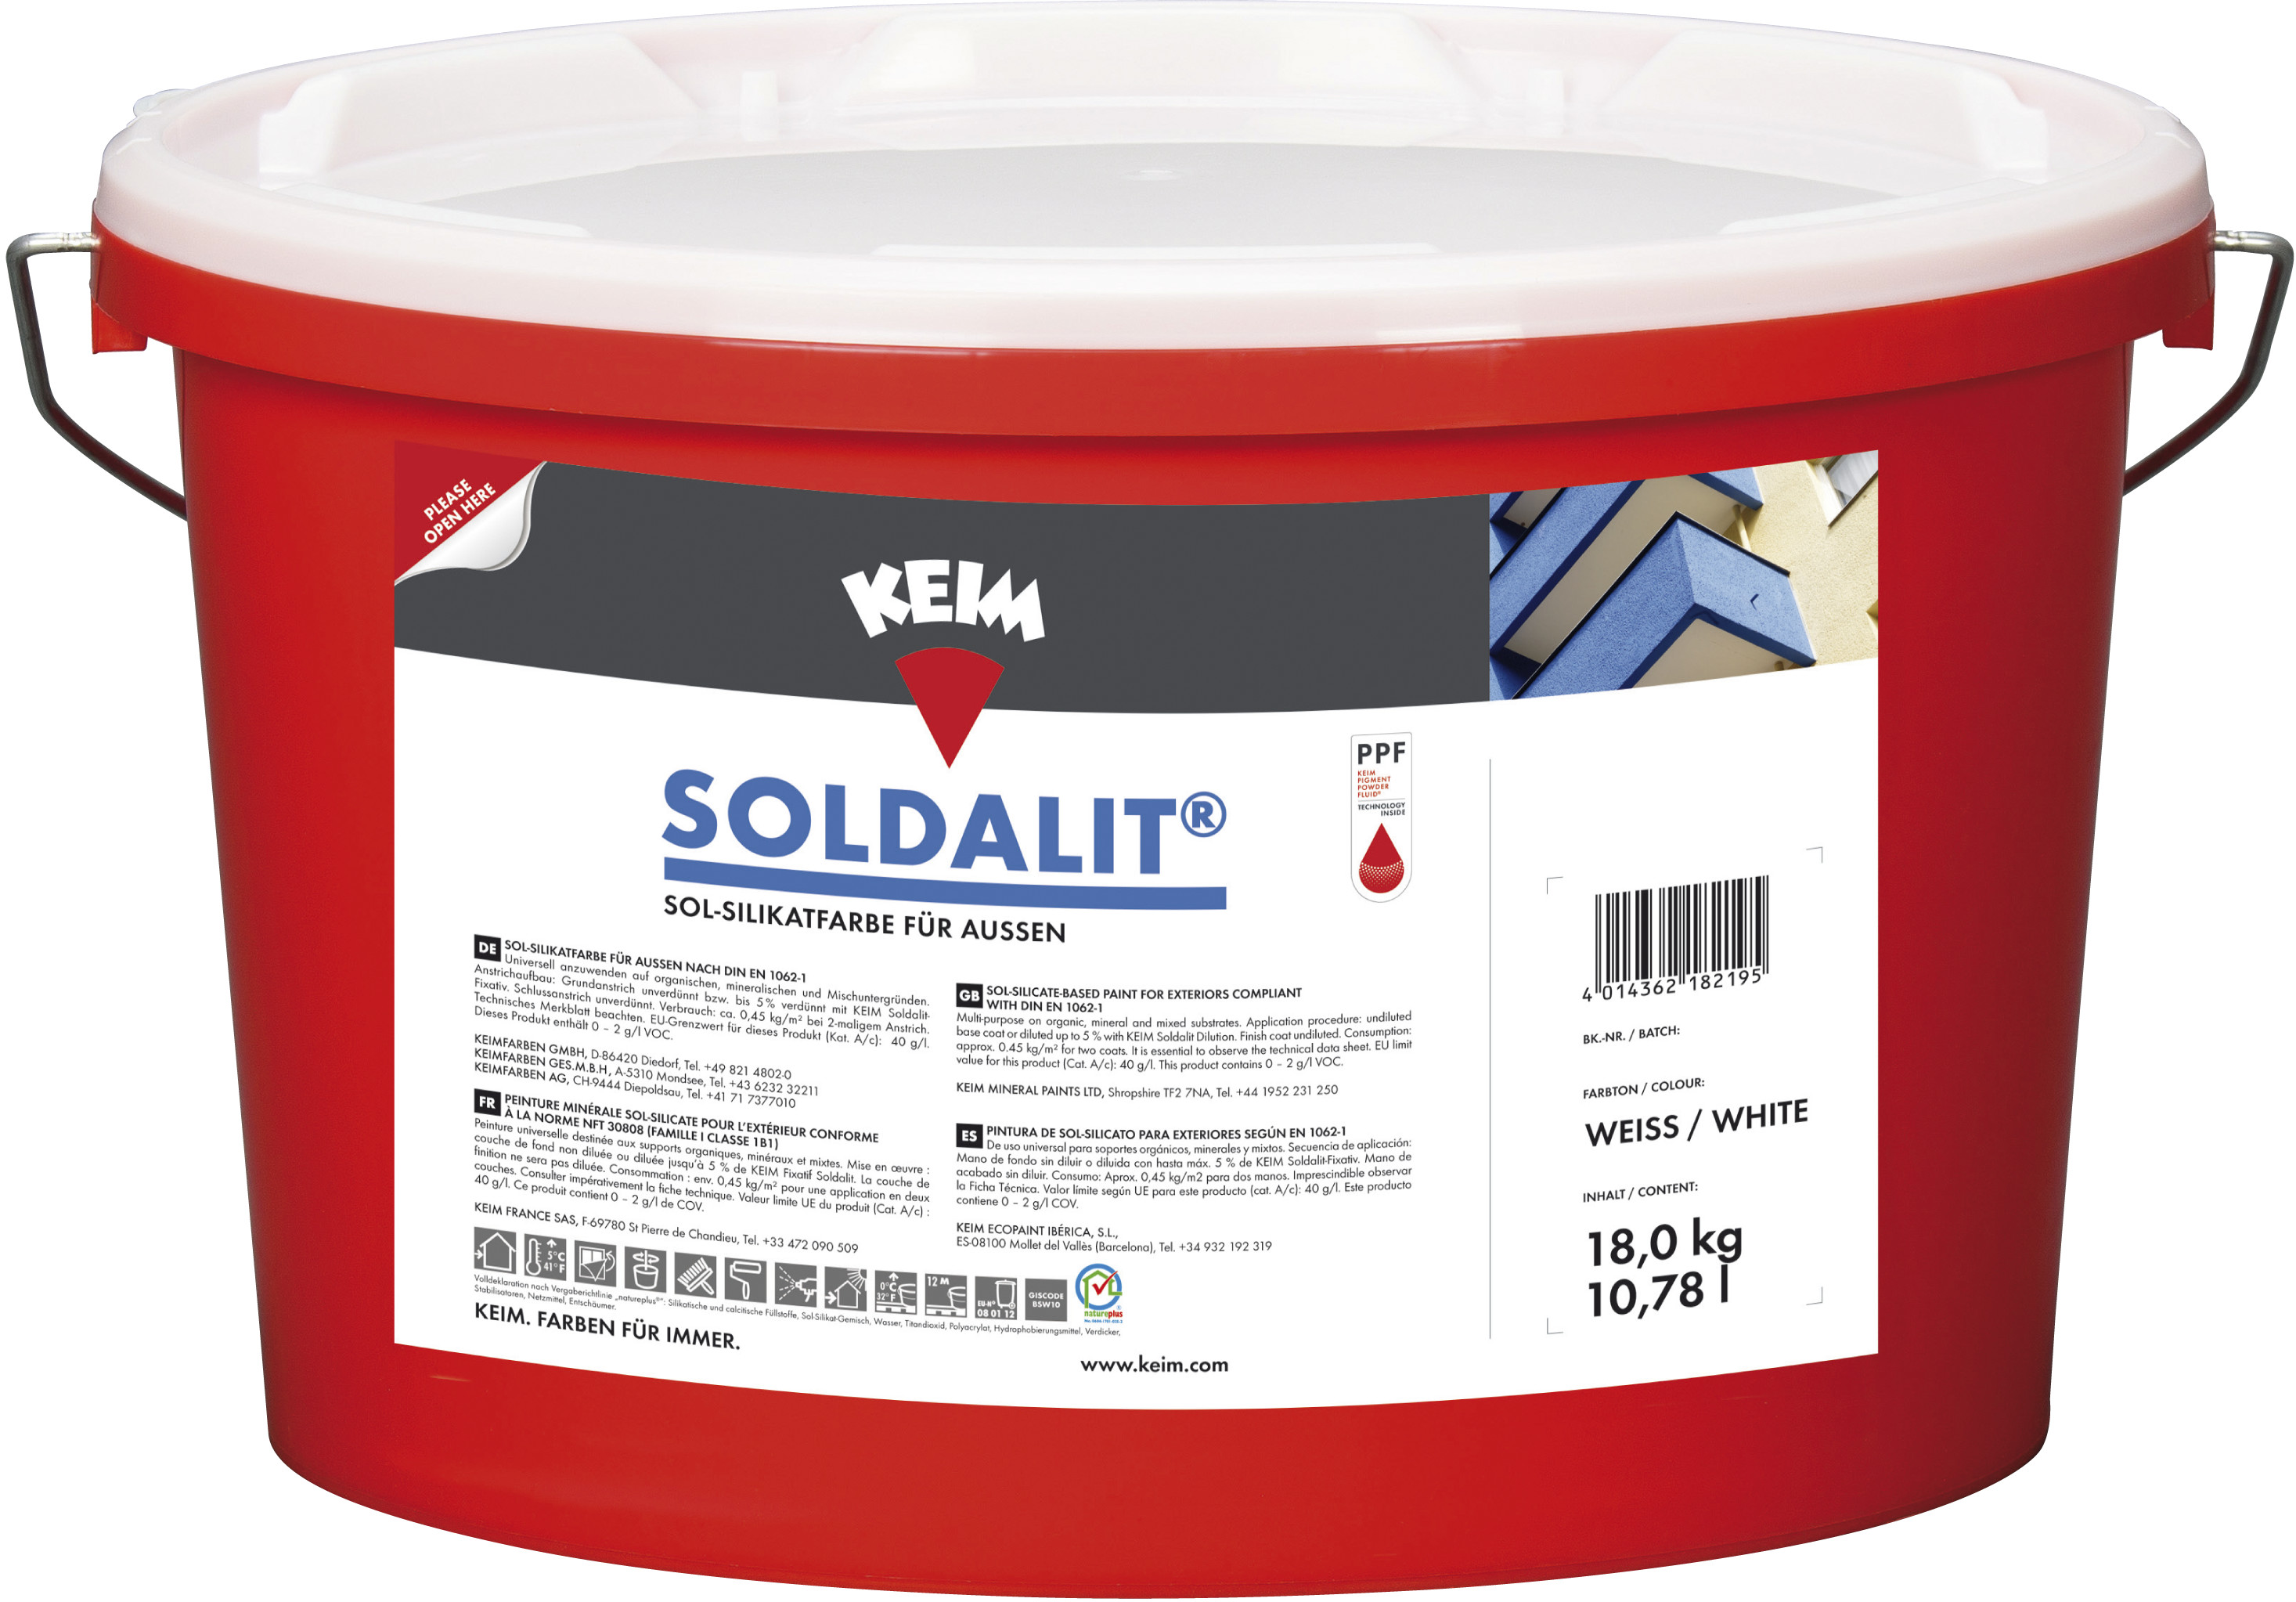 Turbo Wohnwerk | Keim Soldalit Sol-Silikatfarbe | online kaufen IA74